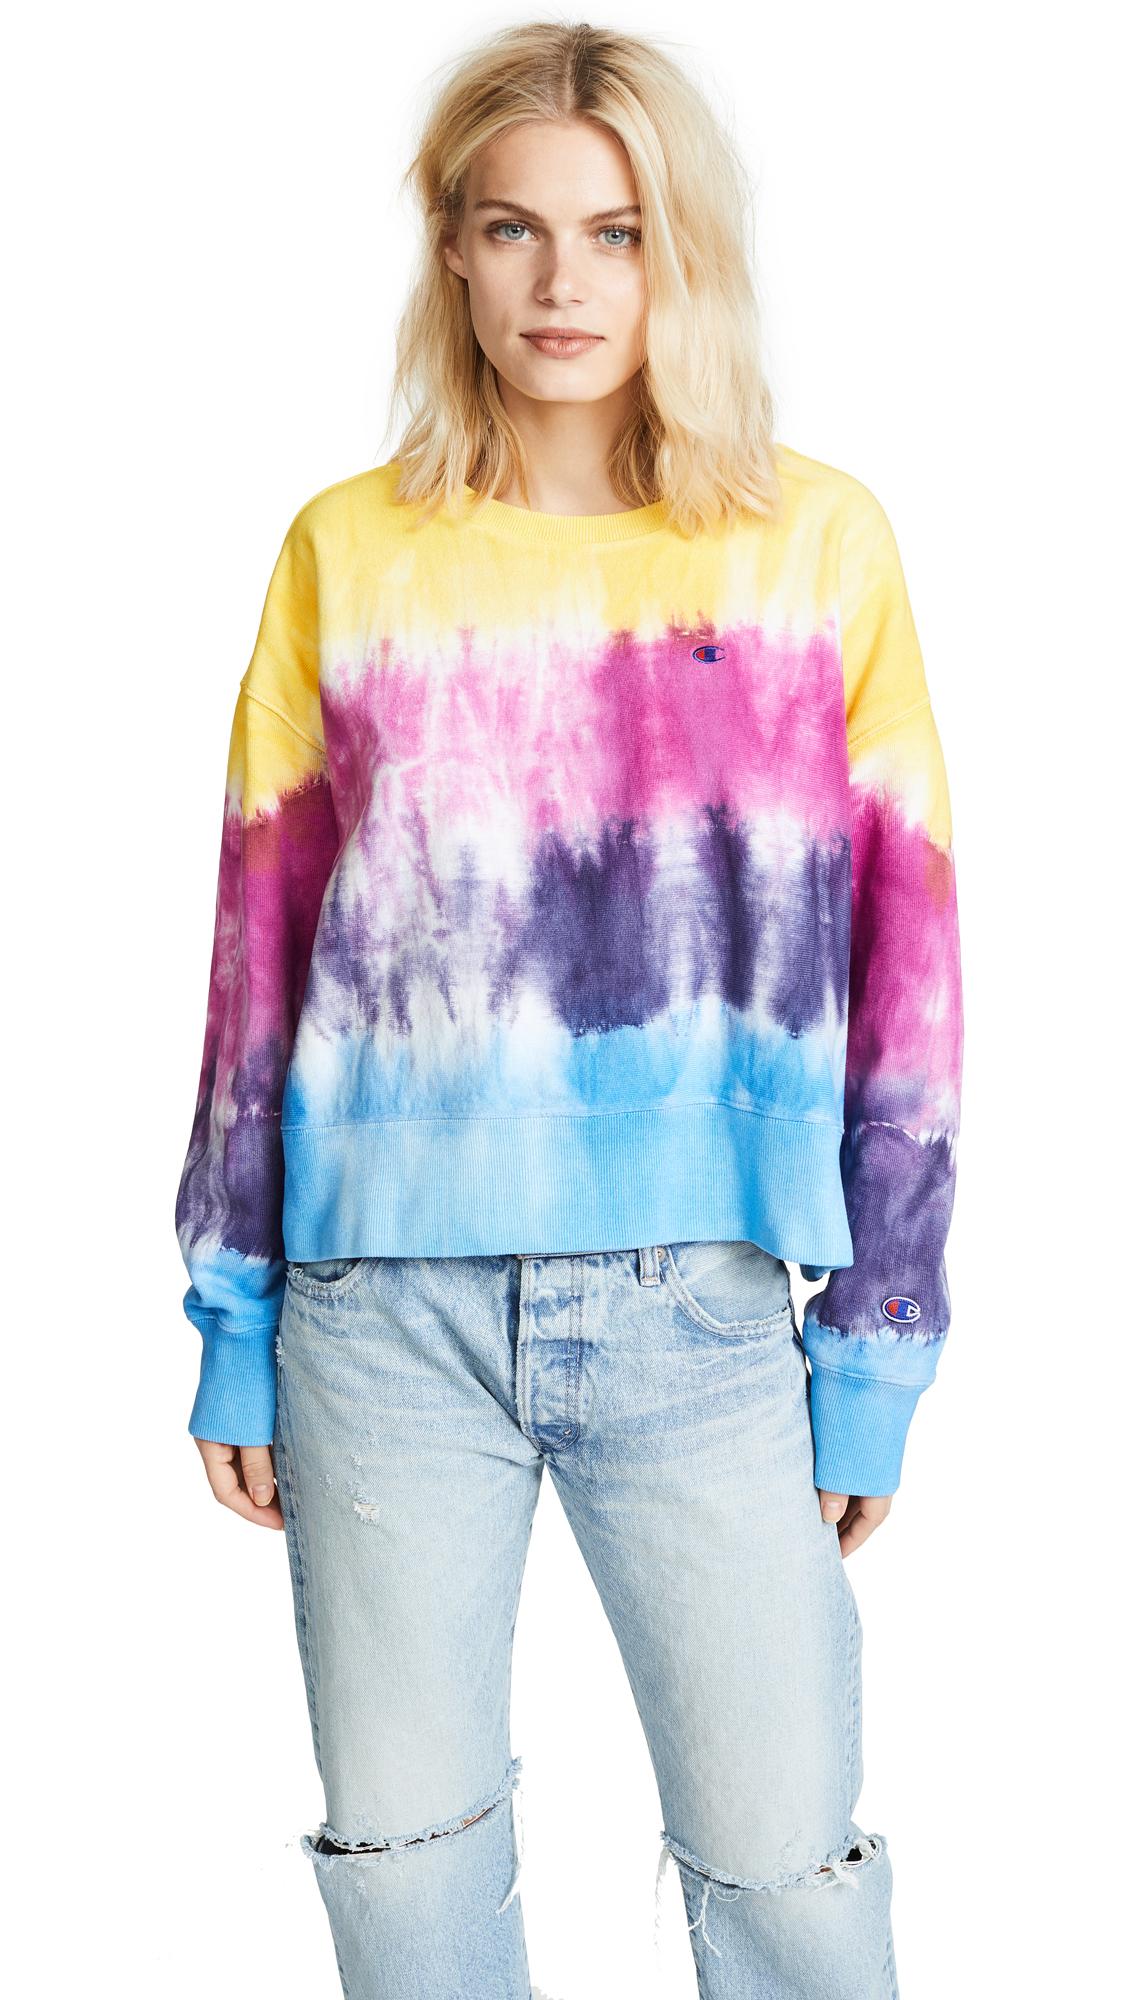 Champion Premium Reverse Weave Crewneck Sweatshirt - Coral/Pink/Pink/Blue